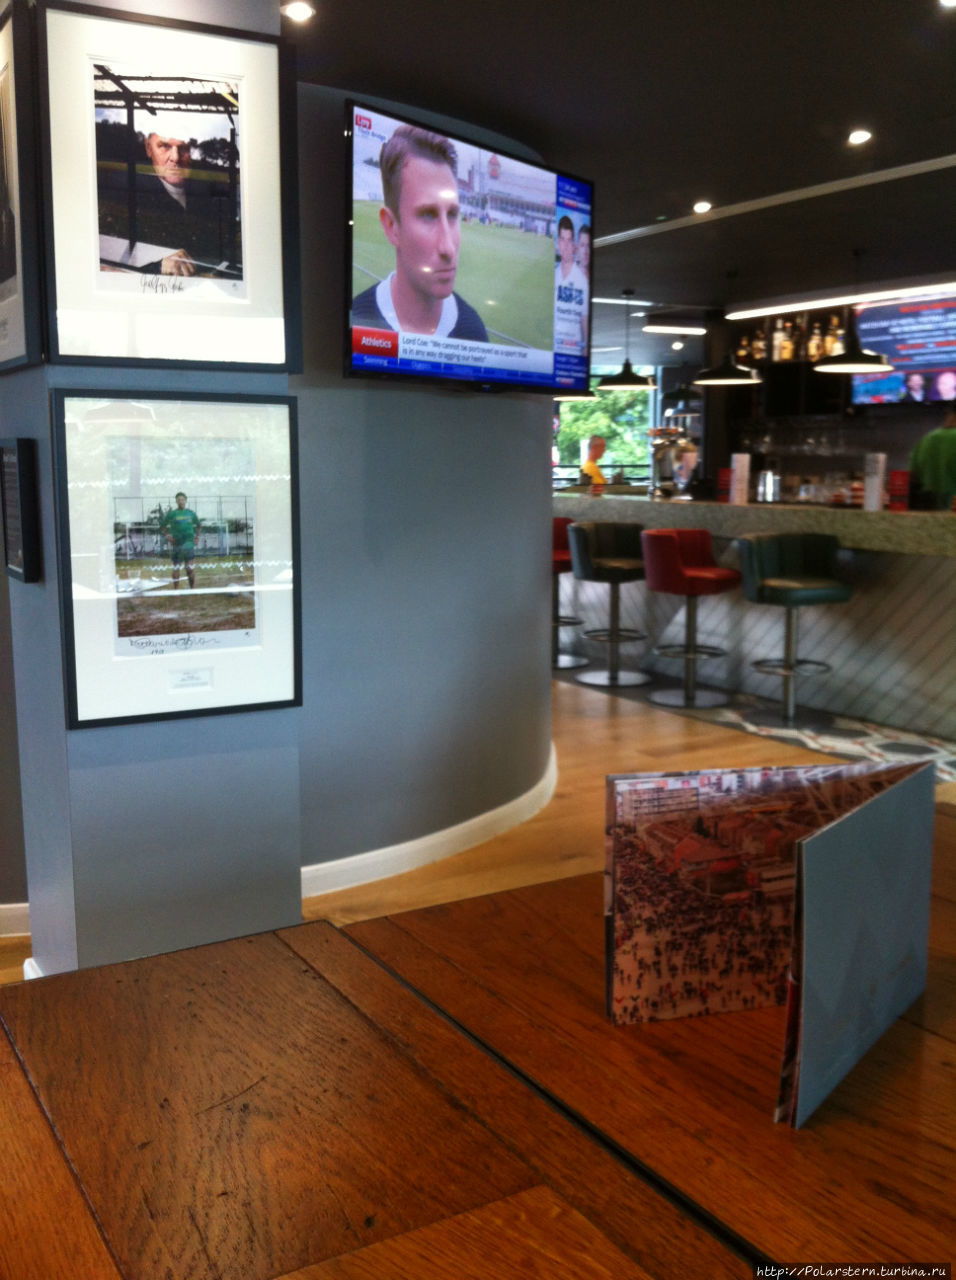 Hotel Football Манчестер, Великобритания